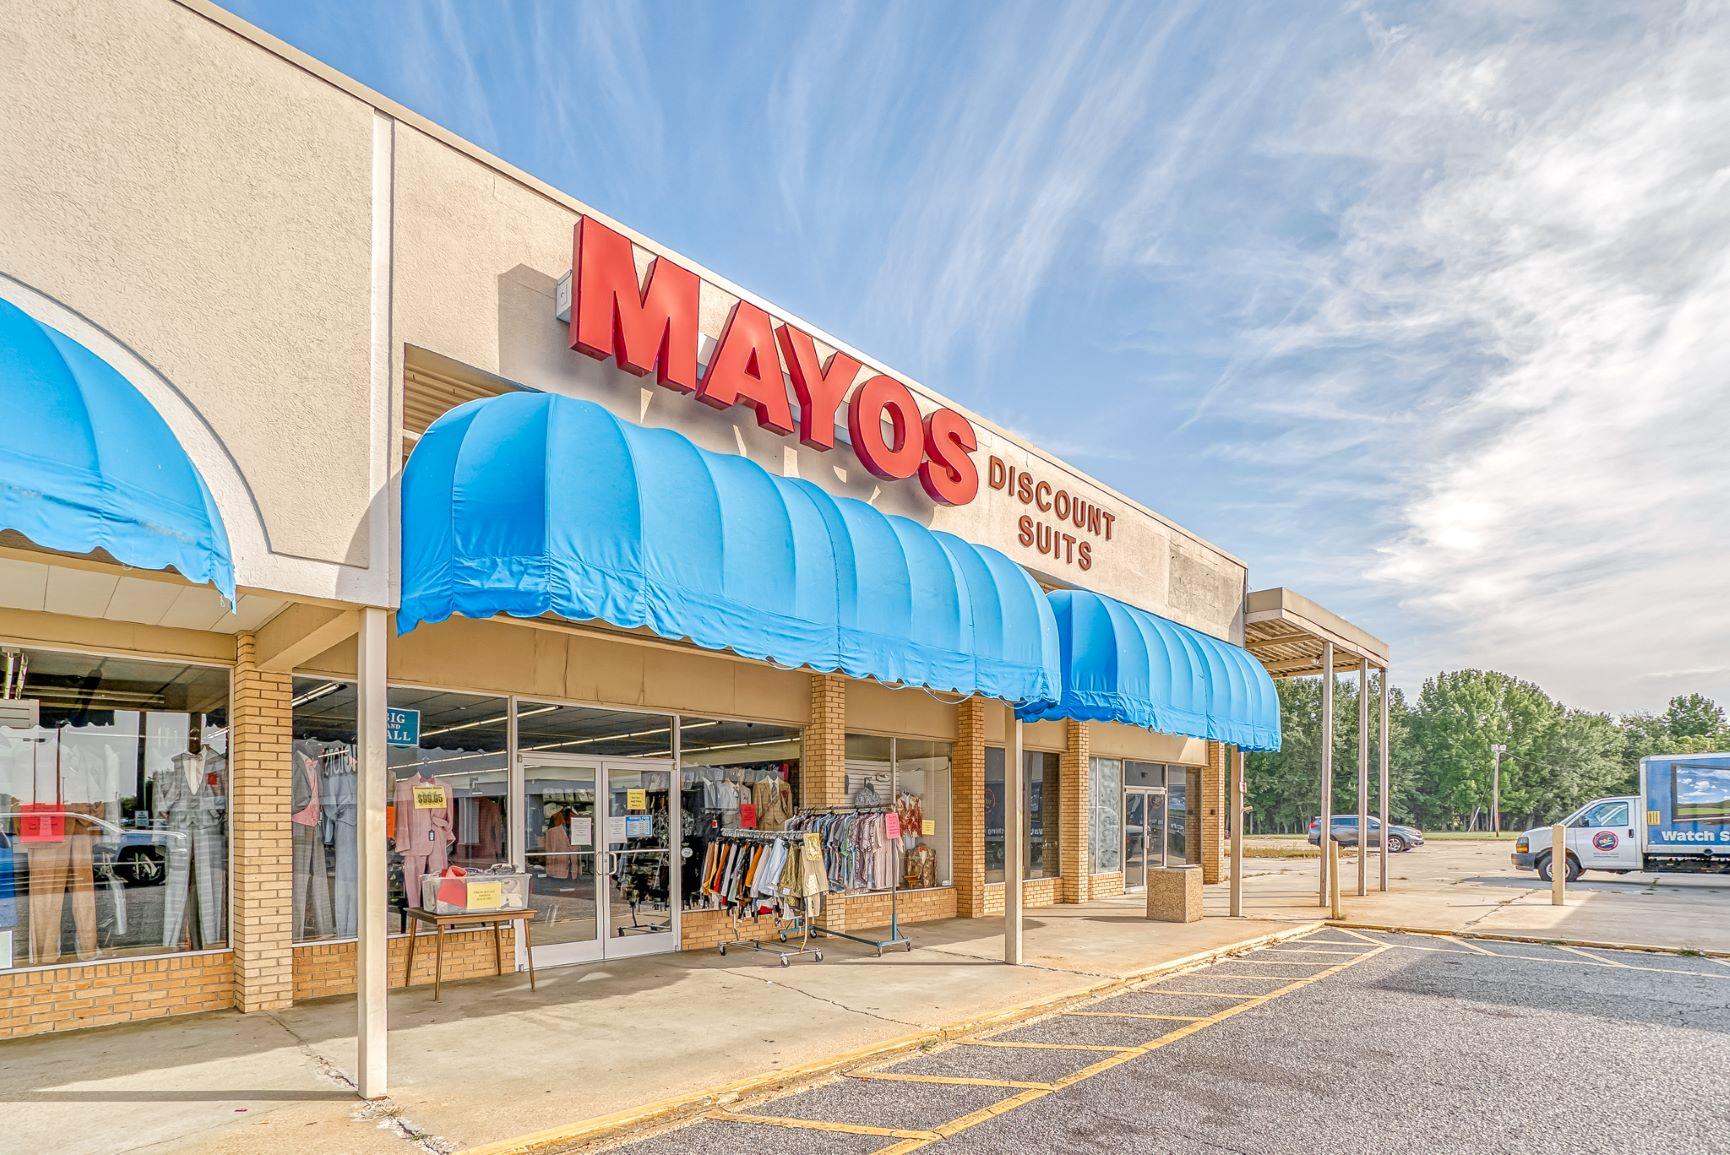 Wesmark Plaza - Mayo's Suite City